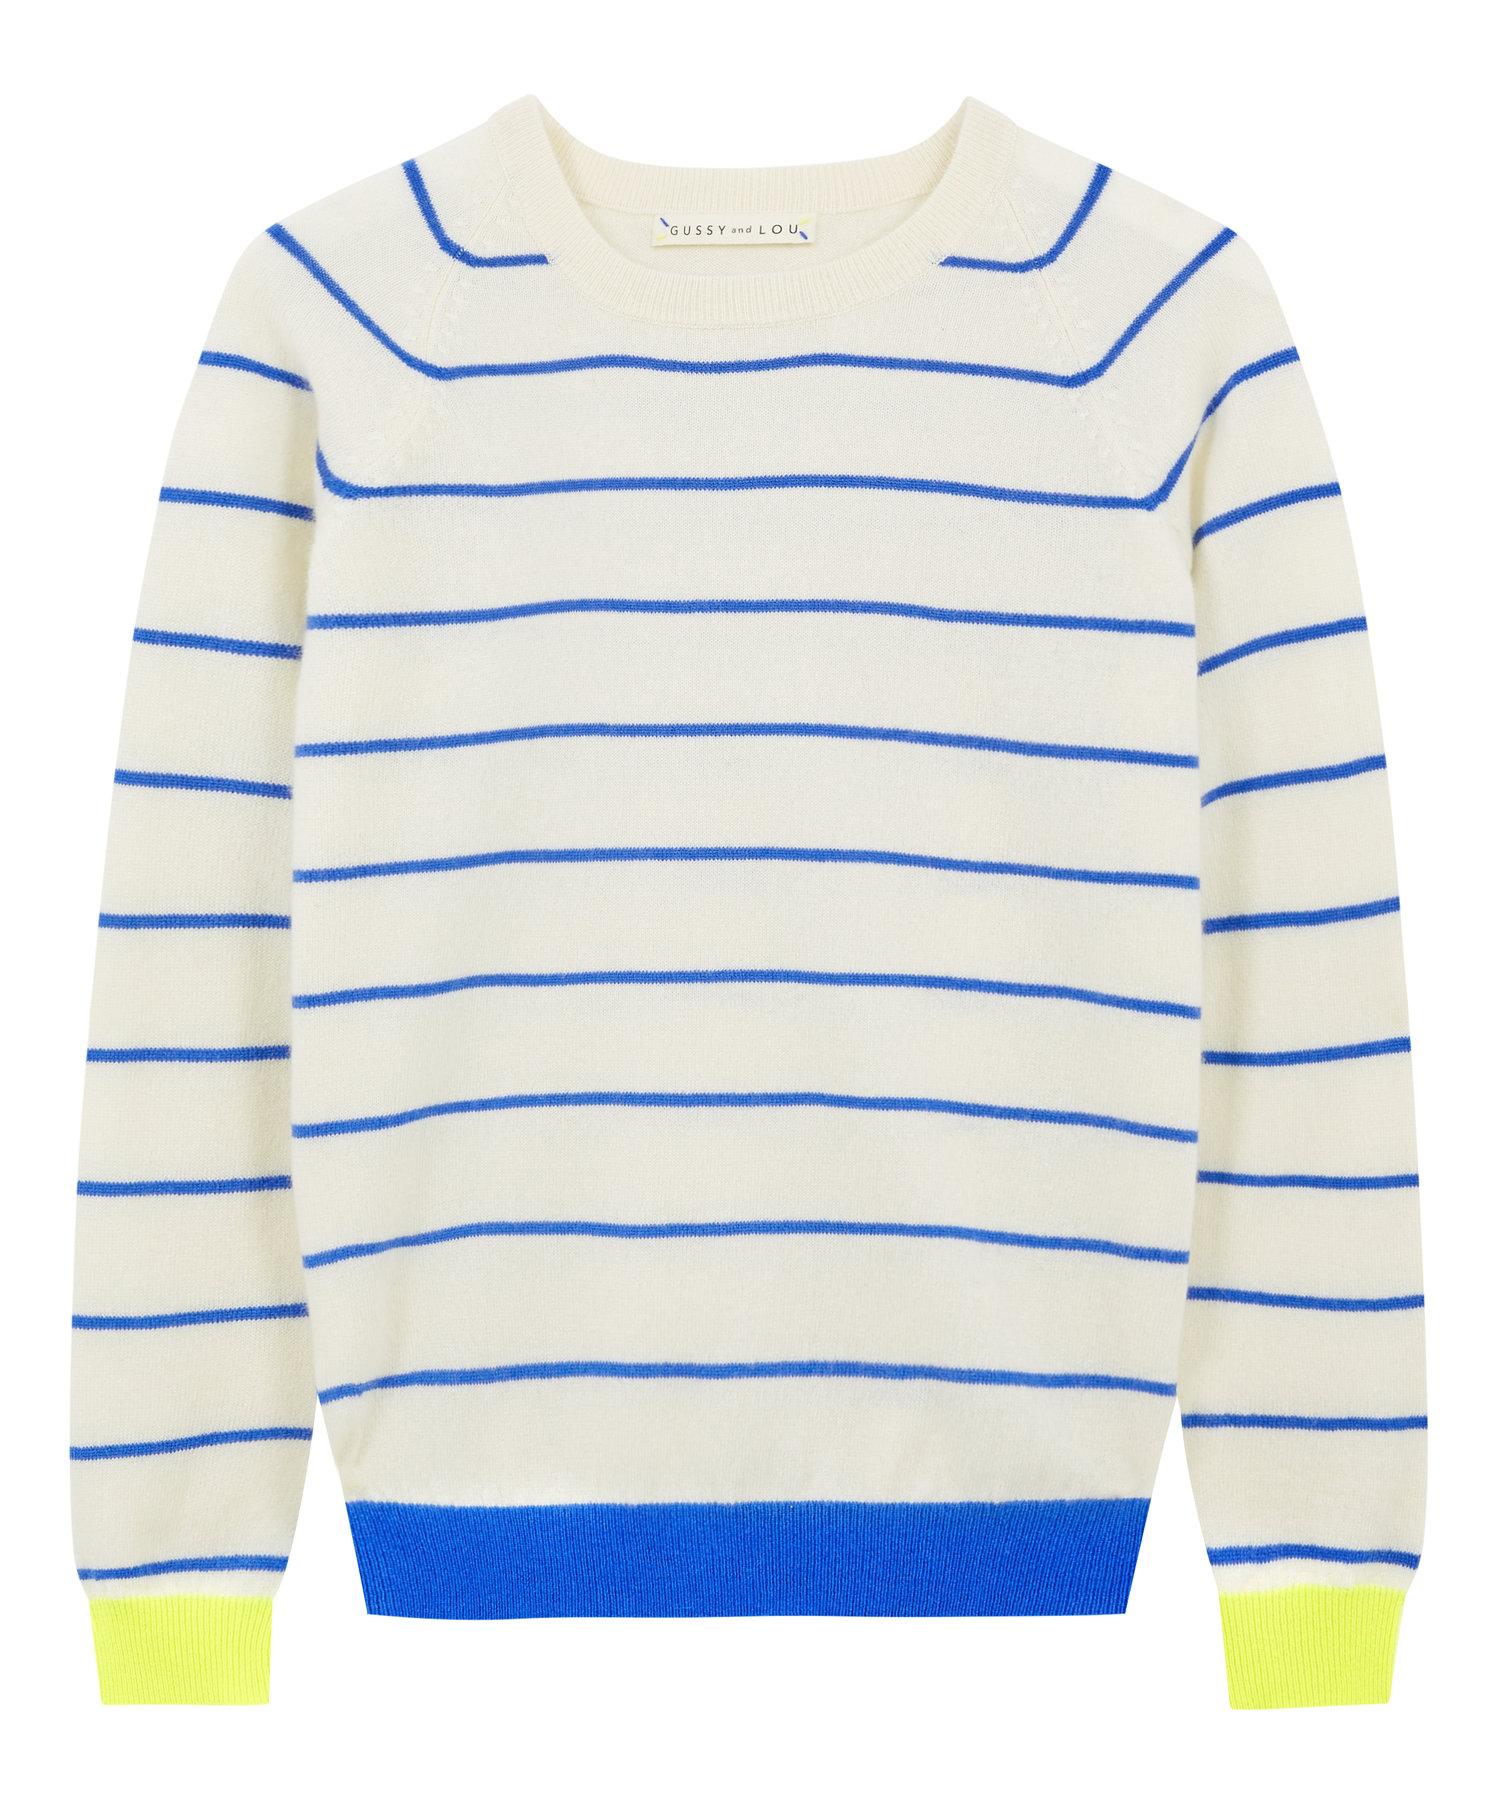 Ladies+Jumper_Blue+Stripes+Neon+Yellow_F.jpg